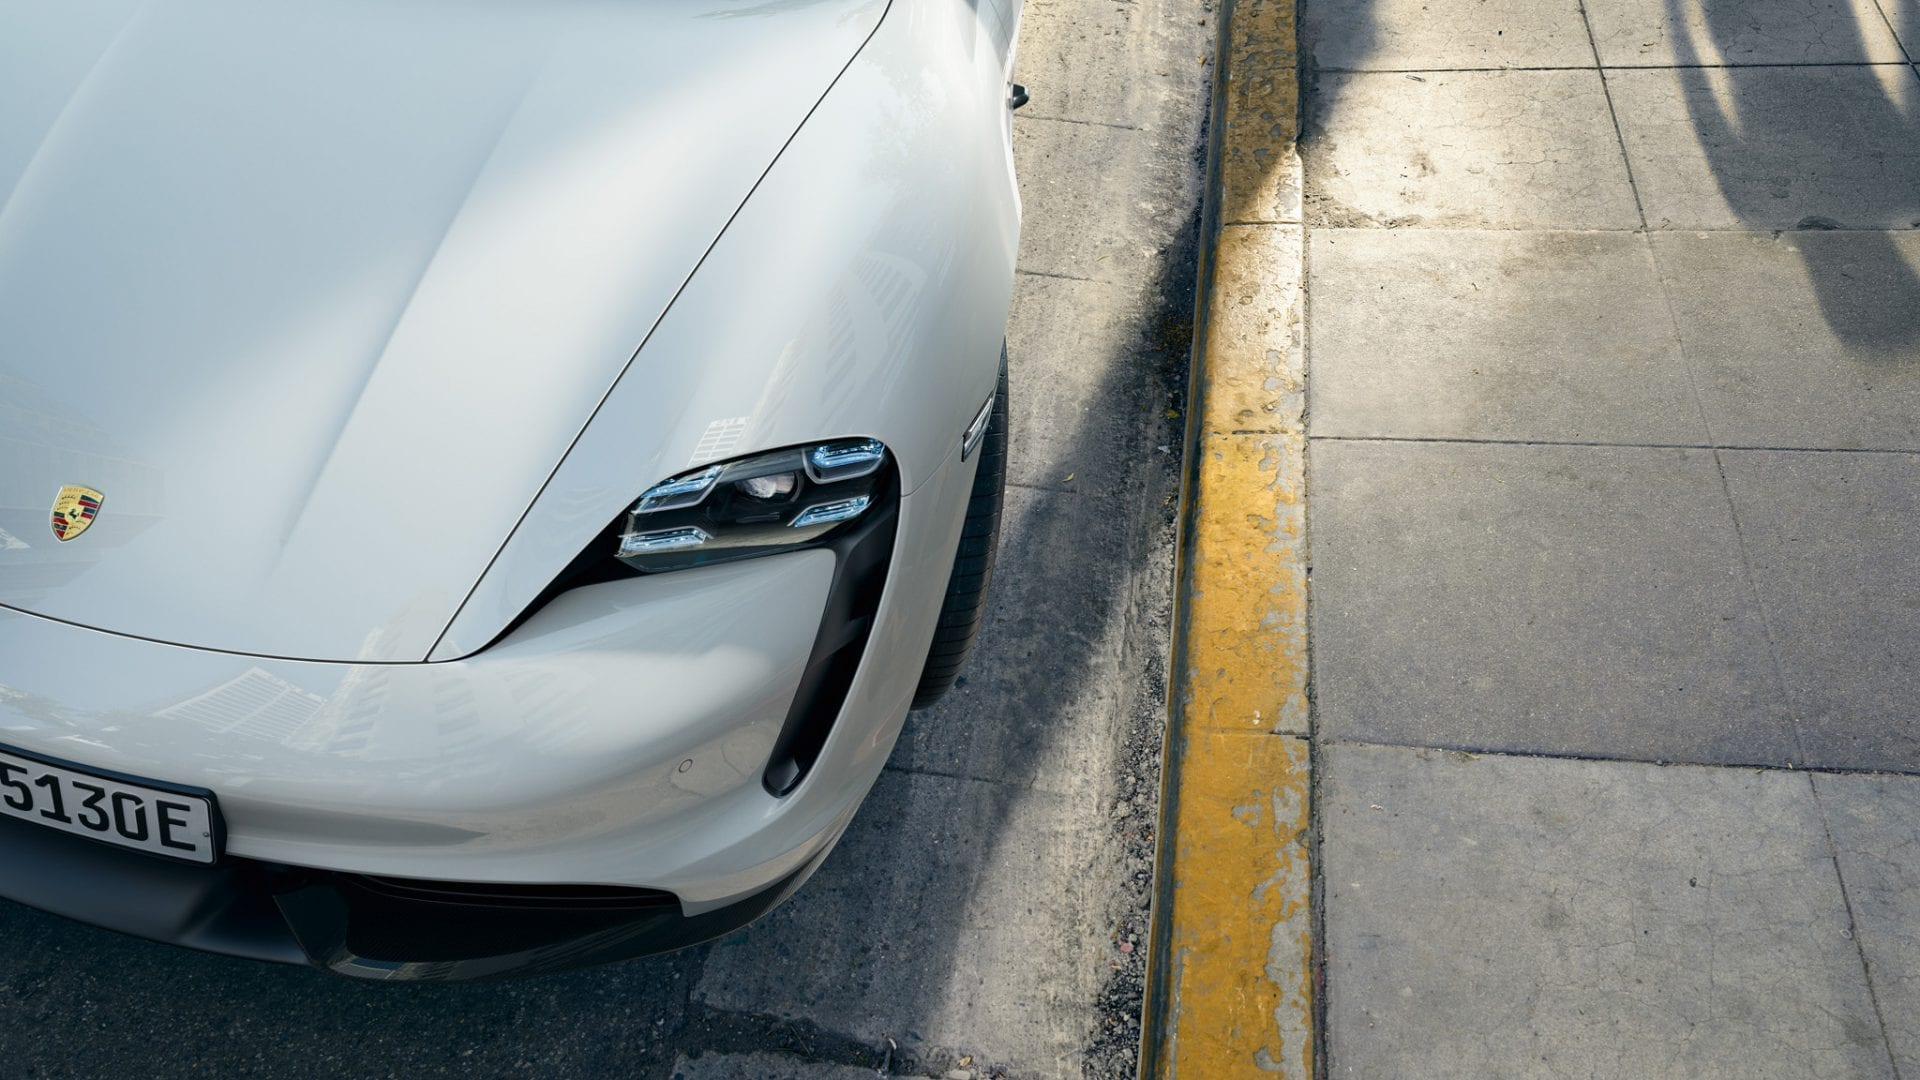 Porsche Taycanin etuvalo.